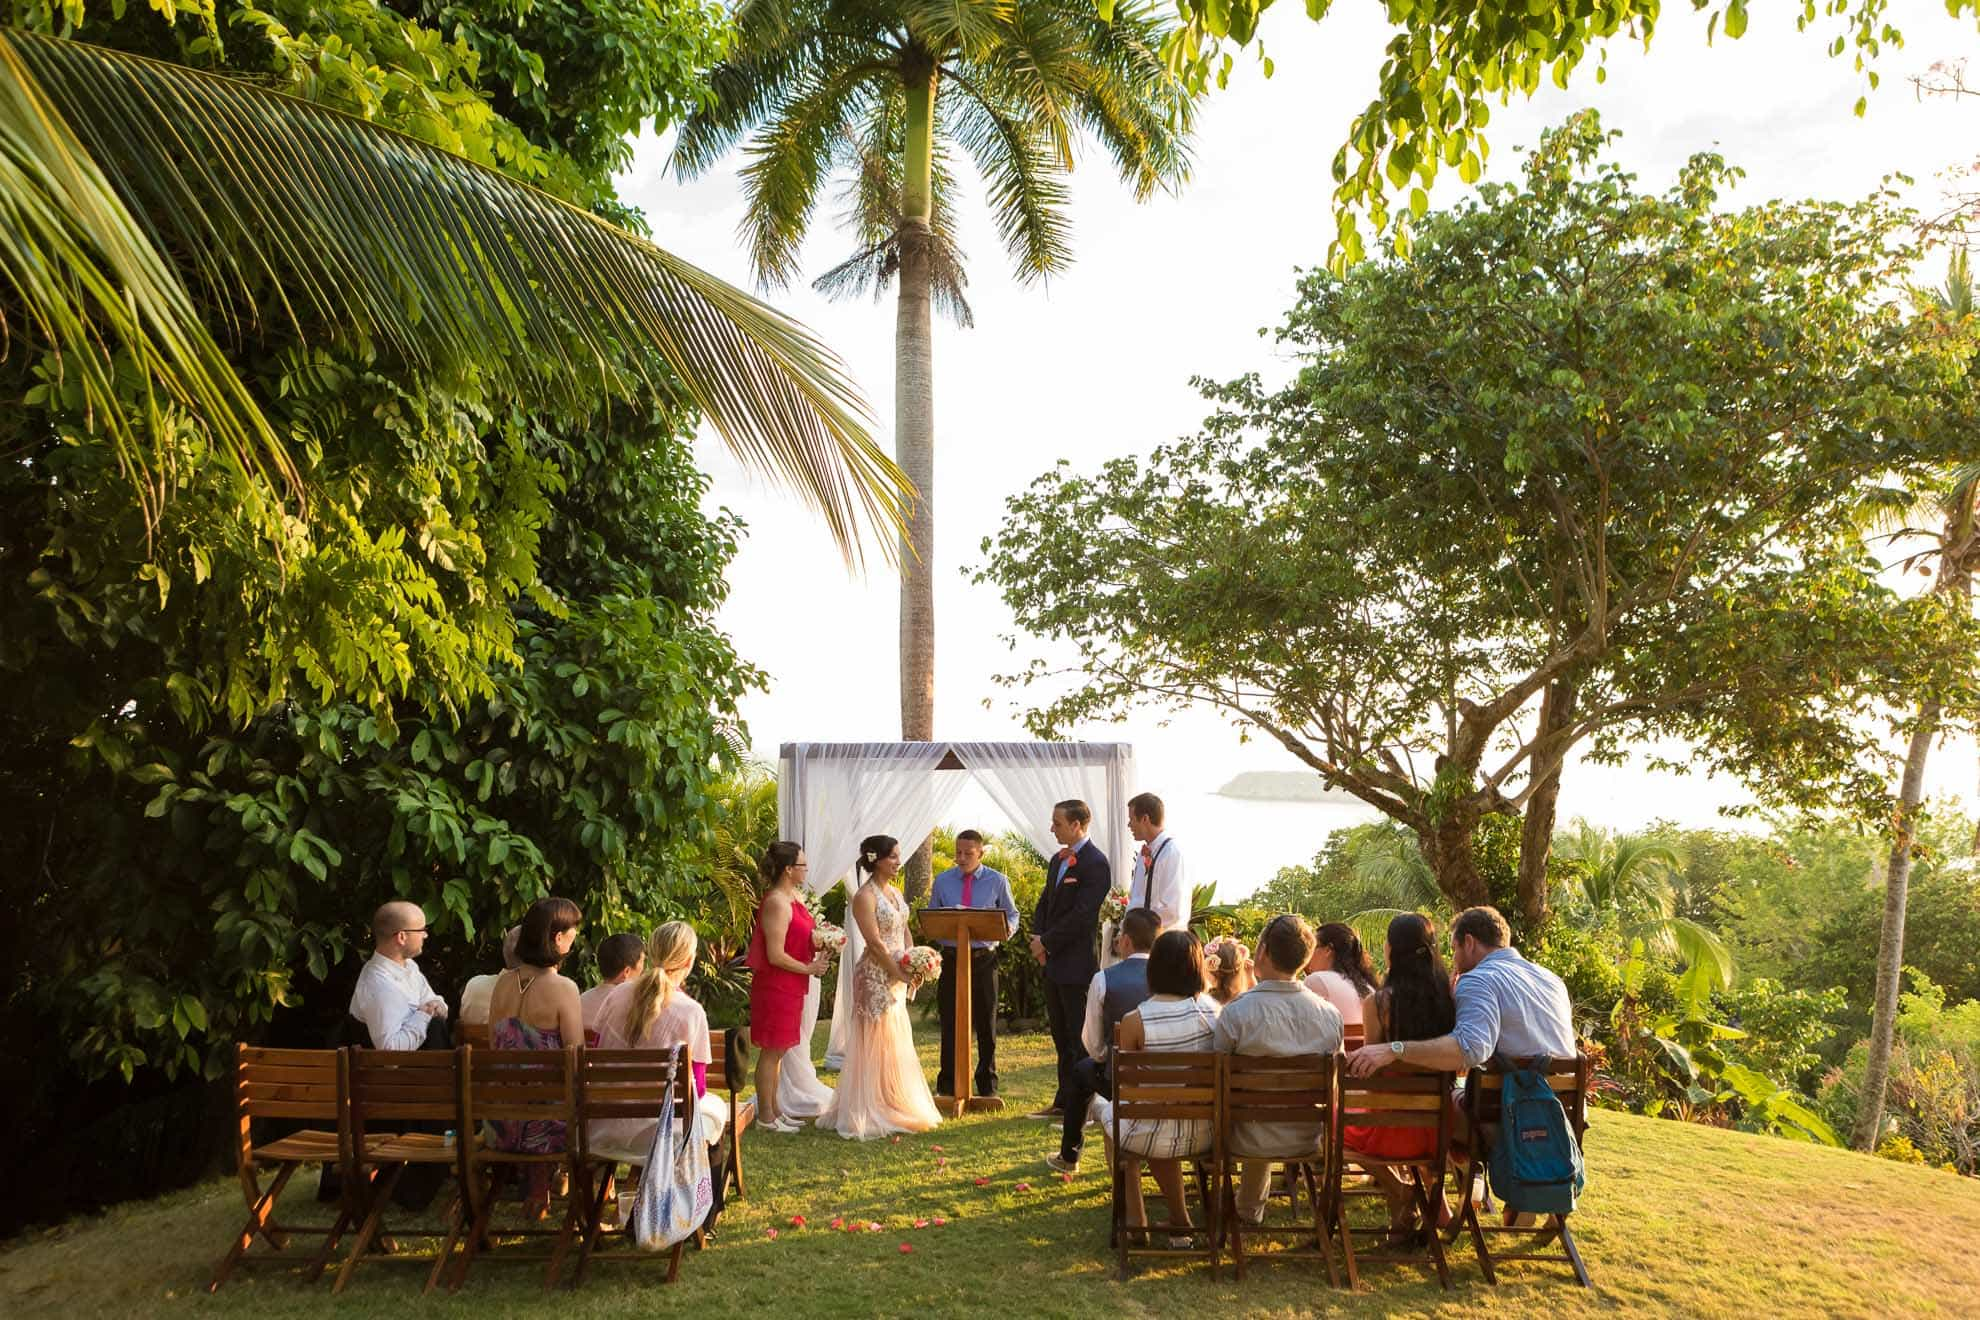 Garden wedding at the grassy knoll in Costa Verde